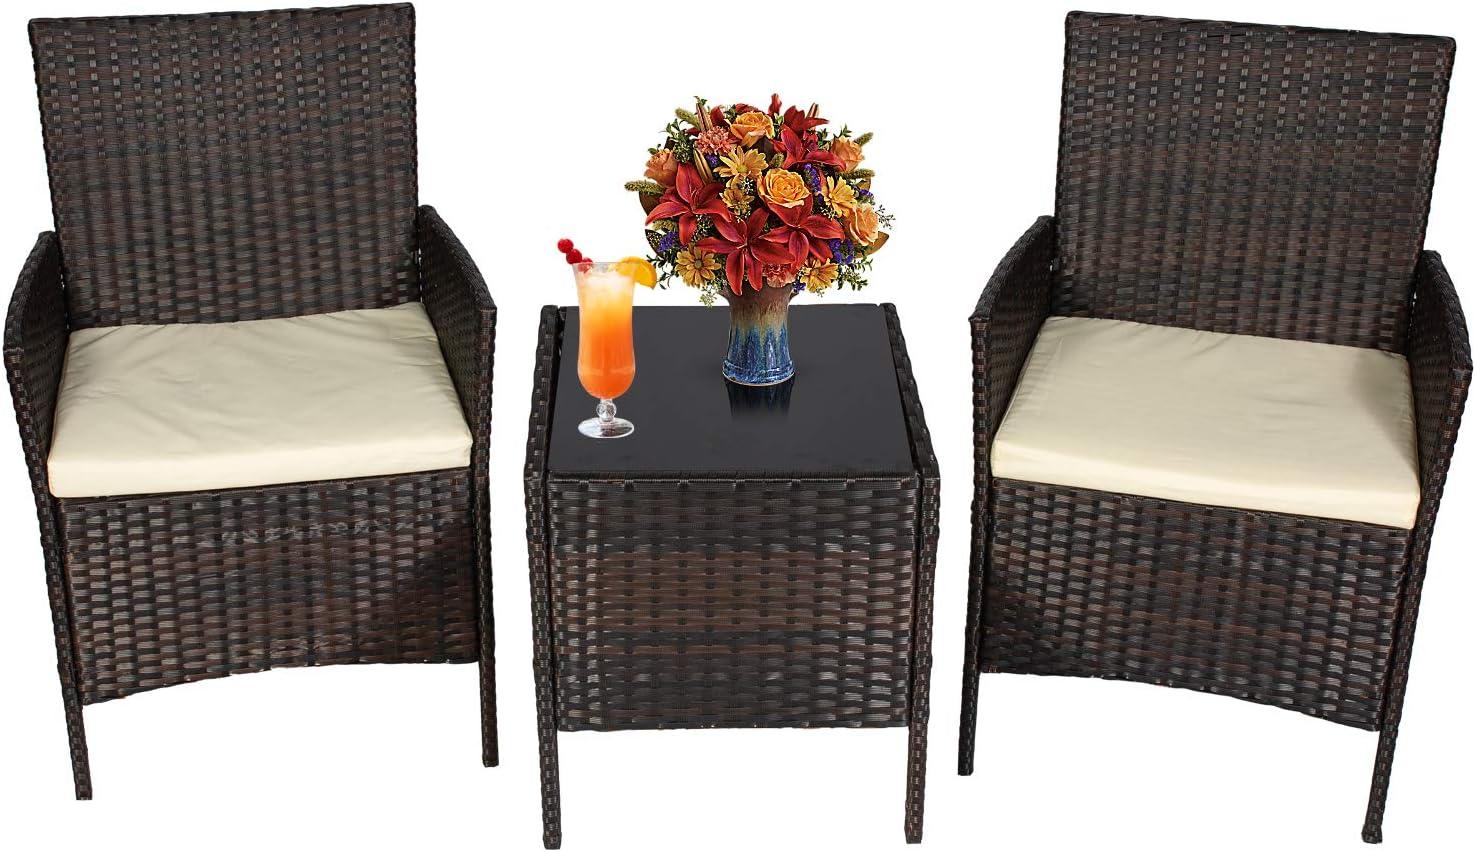 Detroit Mall HSQQ Outdoor Patio Furniture Sets PE Sm trust Wicker Rattan Set Bistro